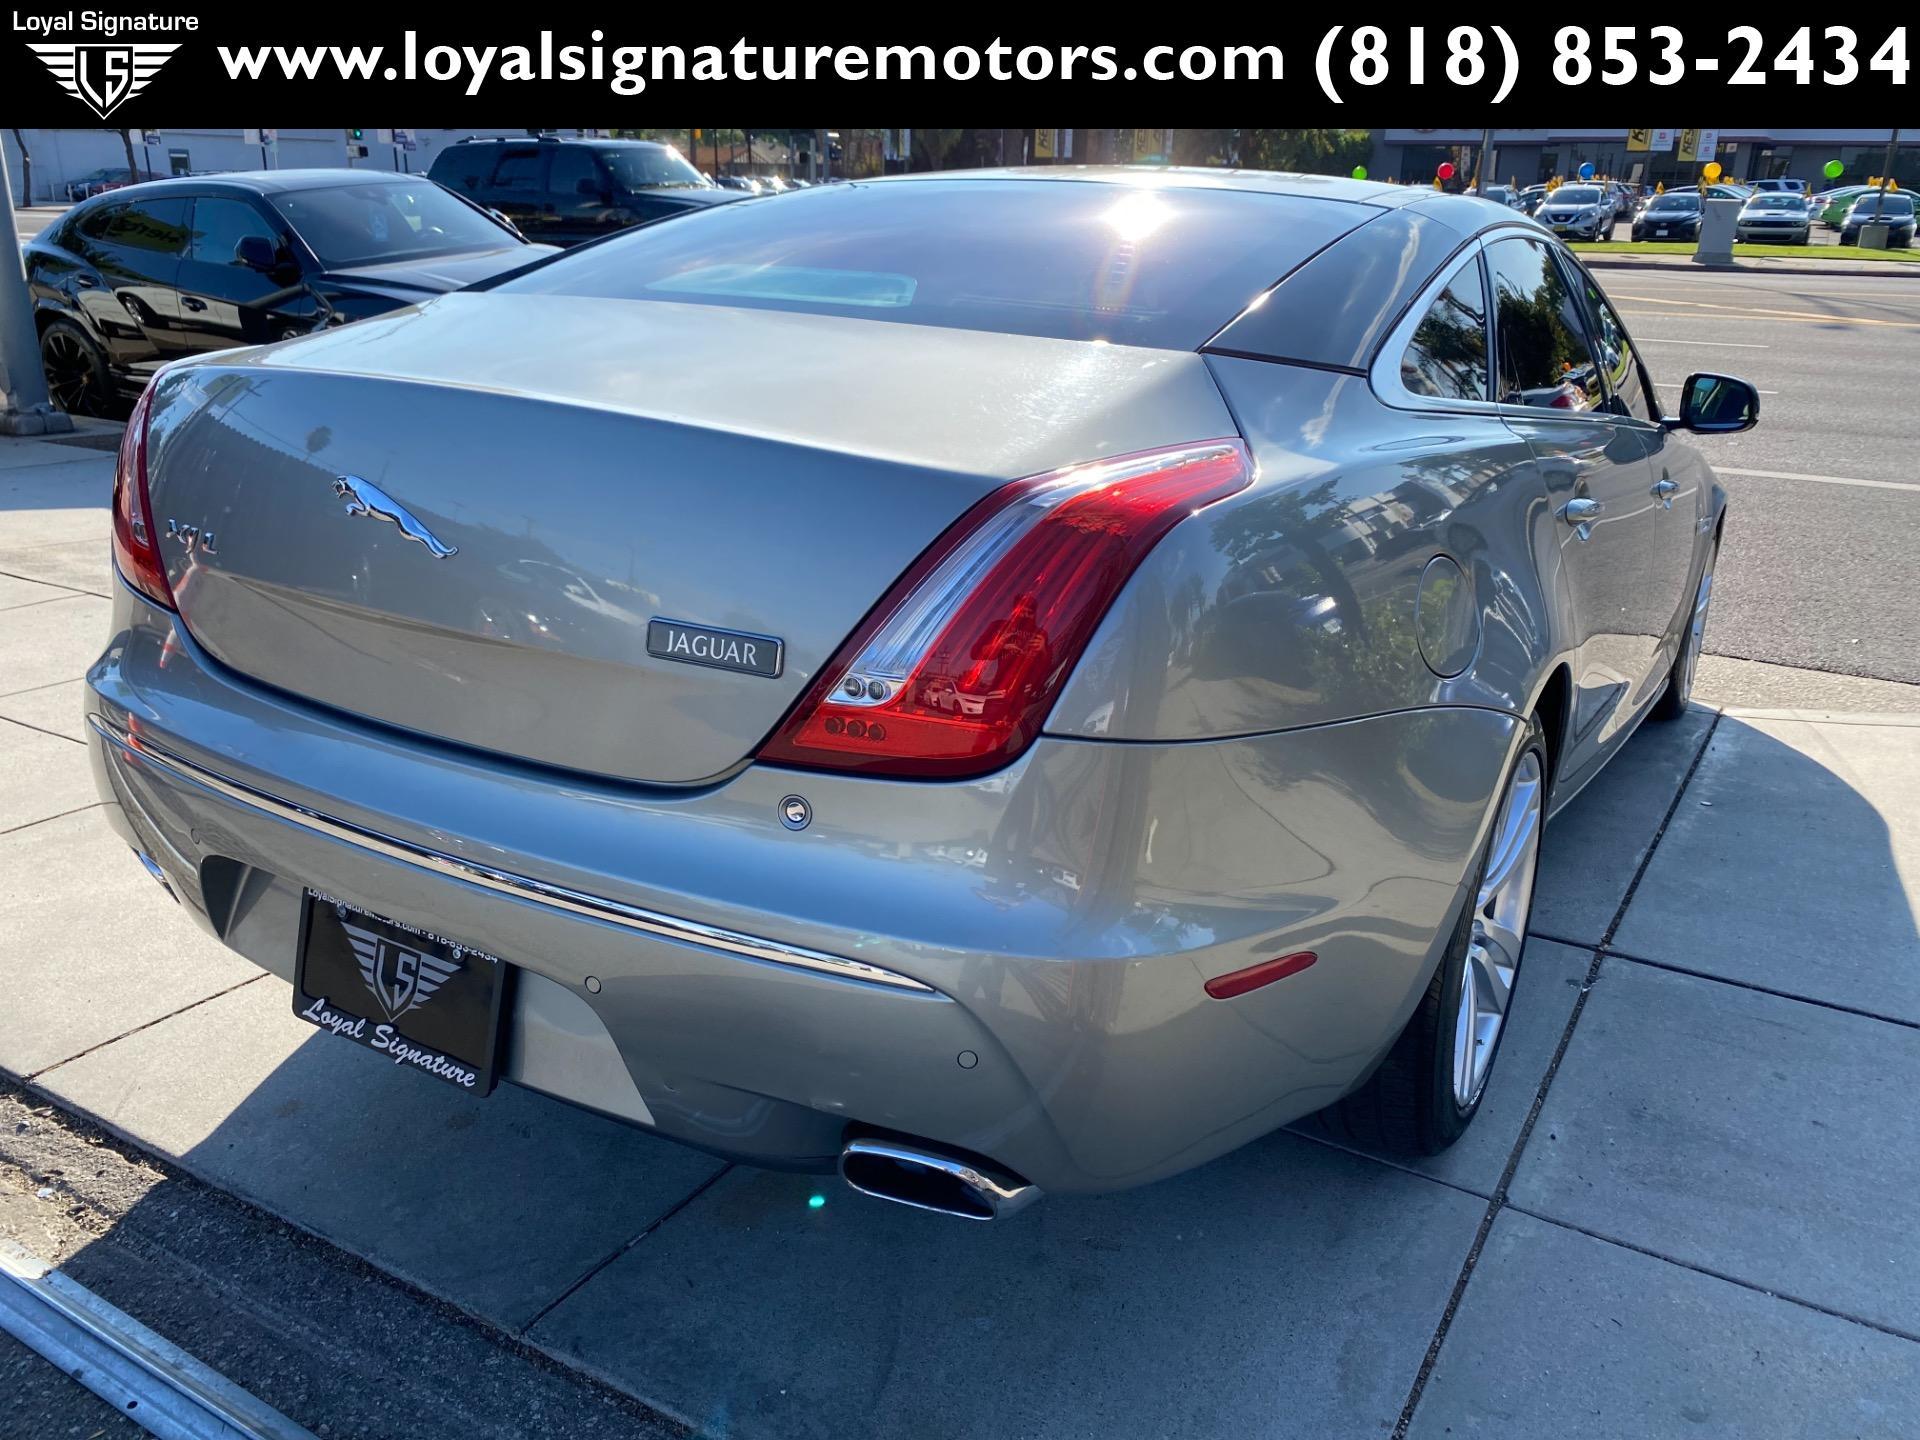 Used-2011-Jaguar-XJL